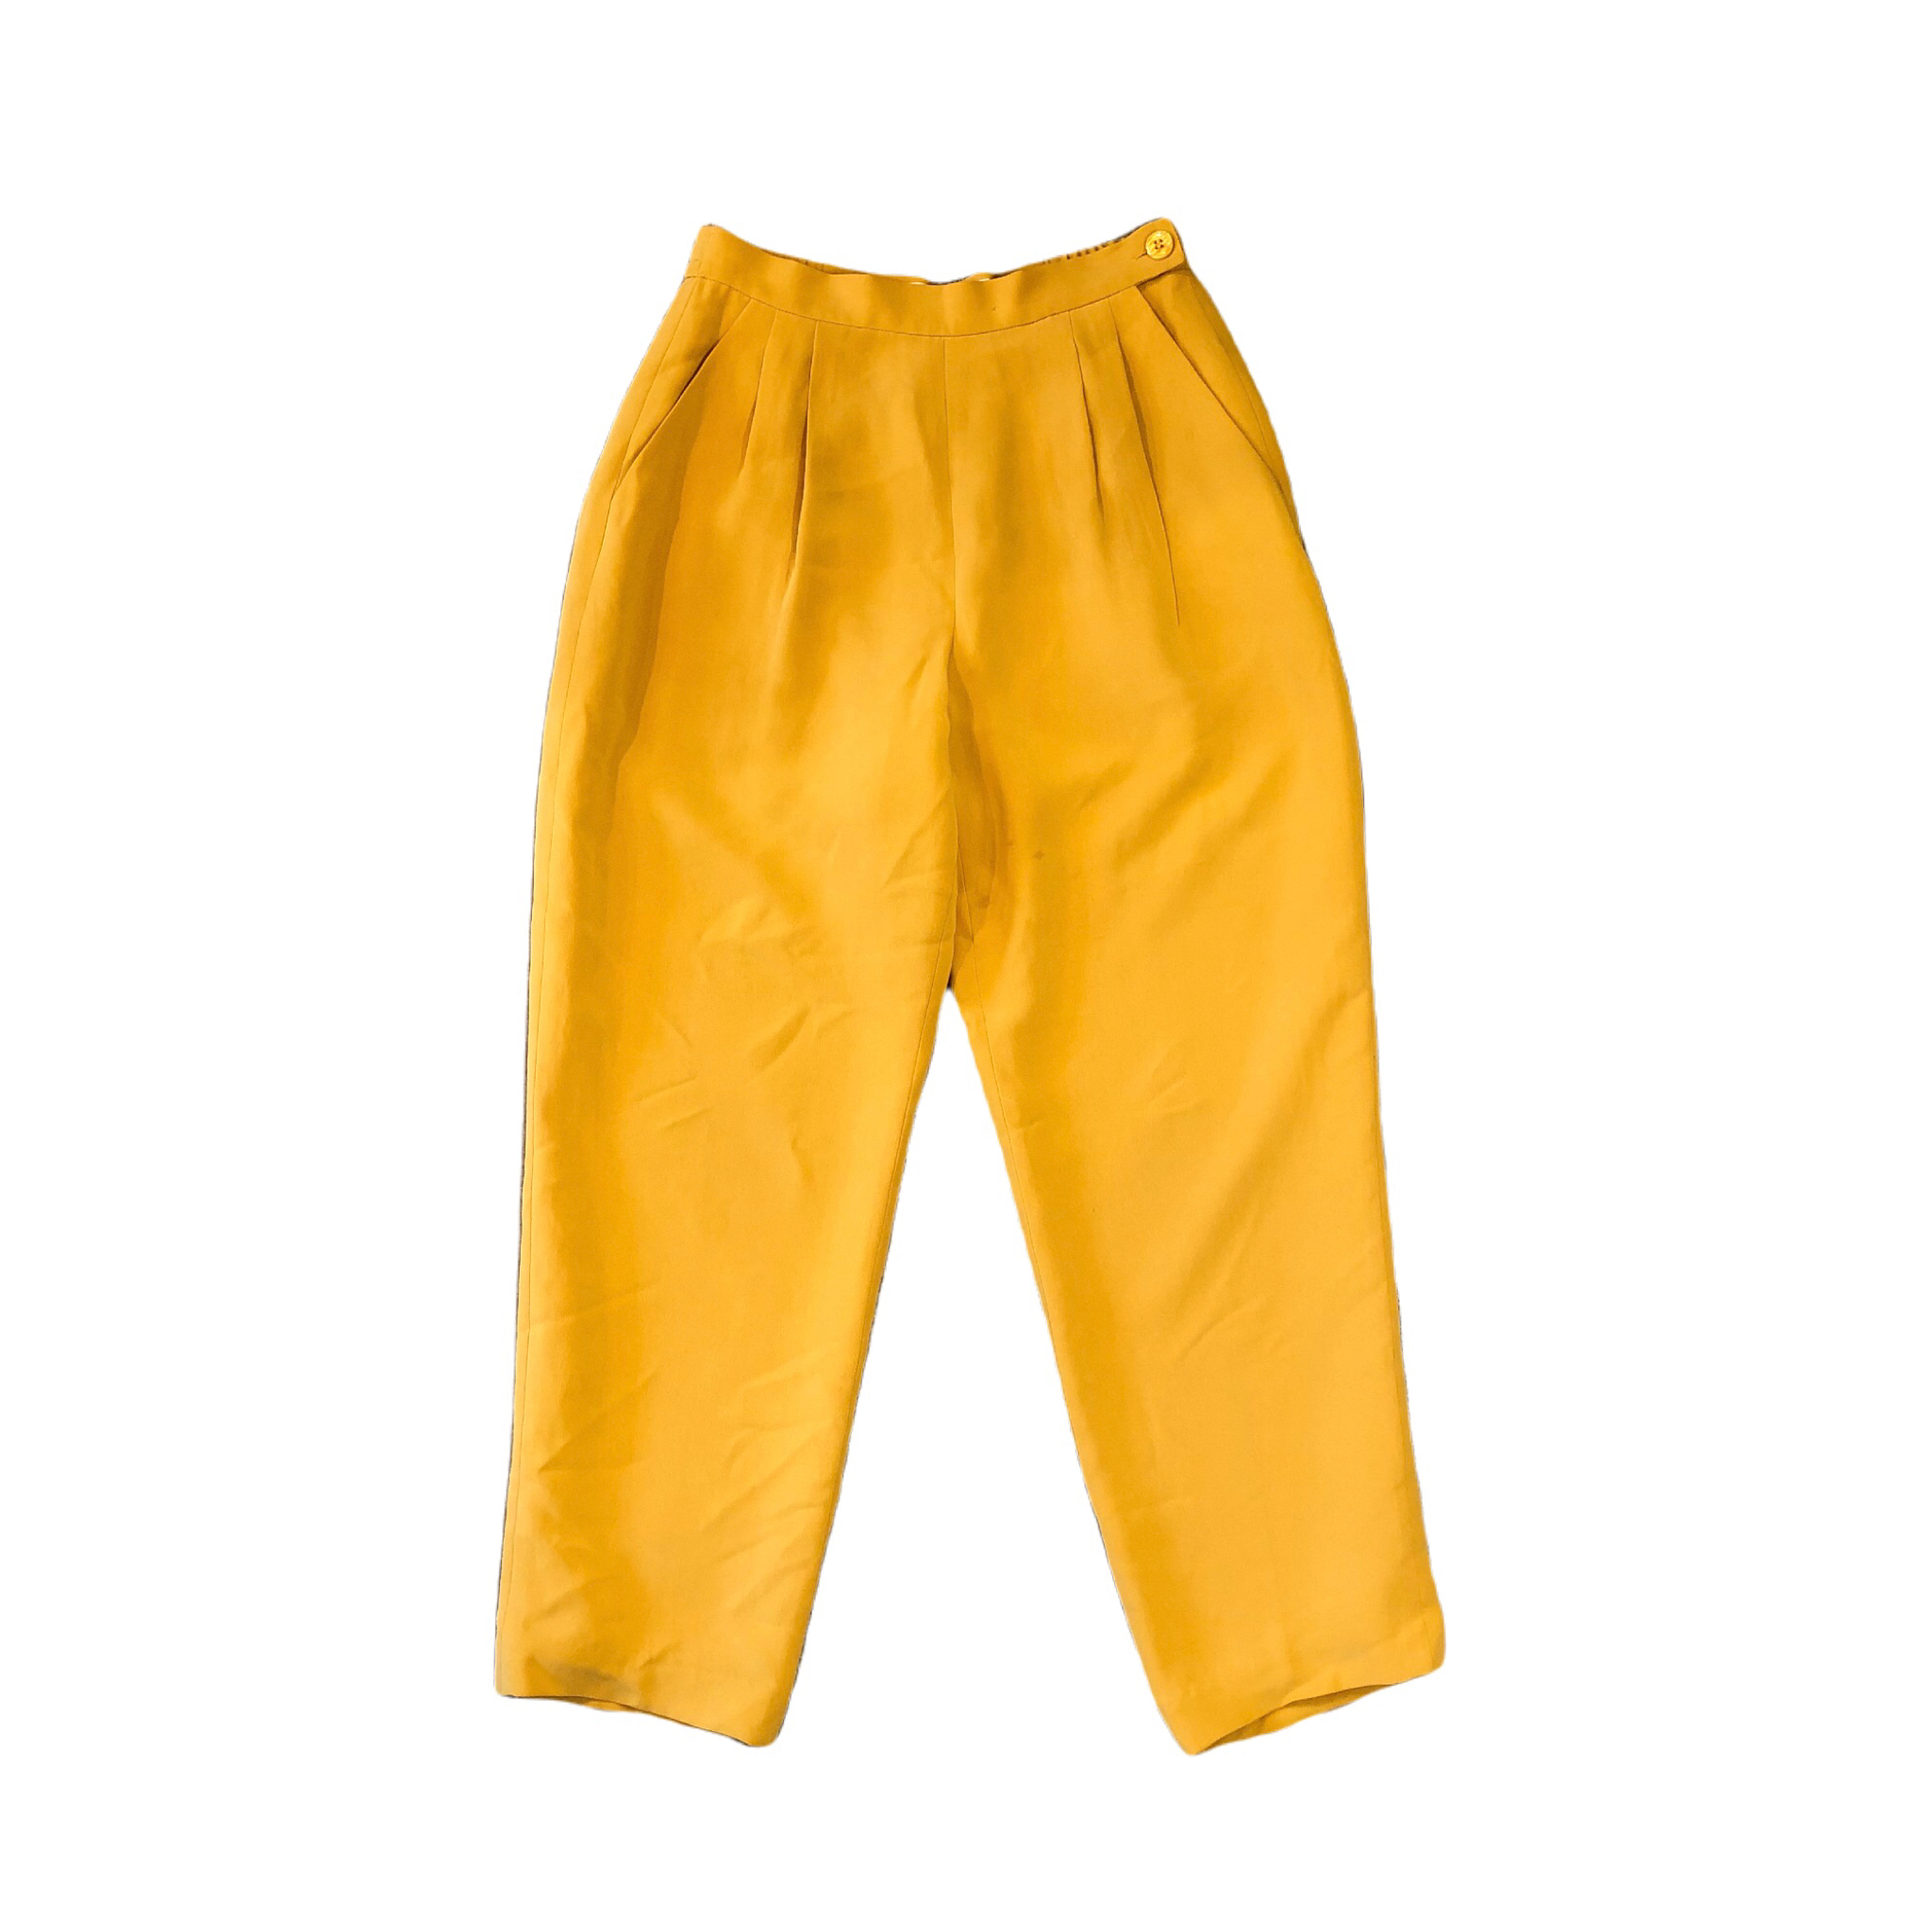 Danabuchman Yellow Pants ¥6,600+tax